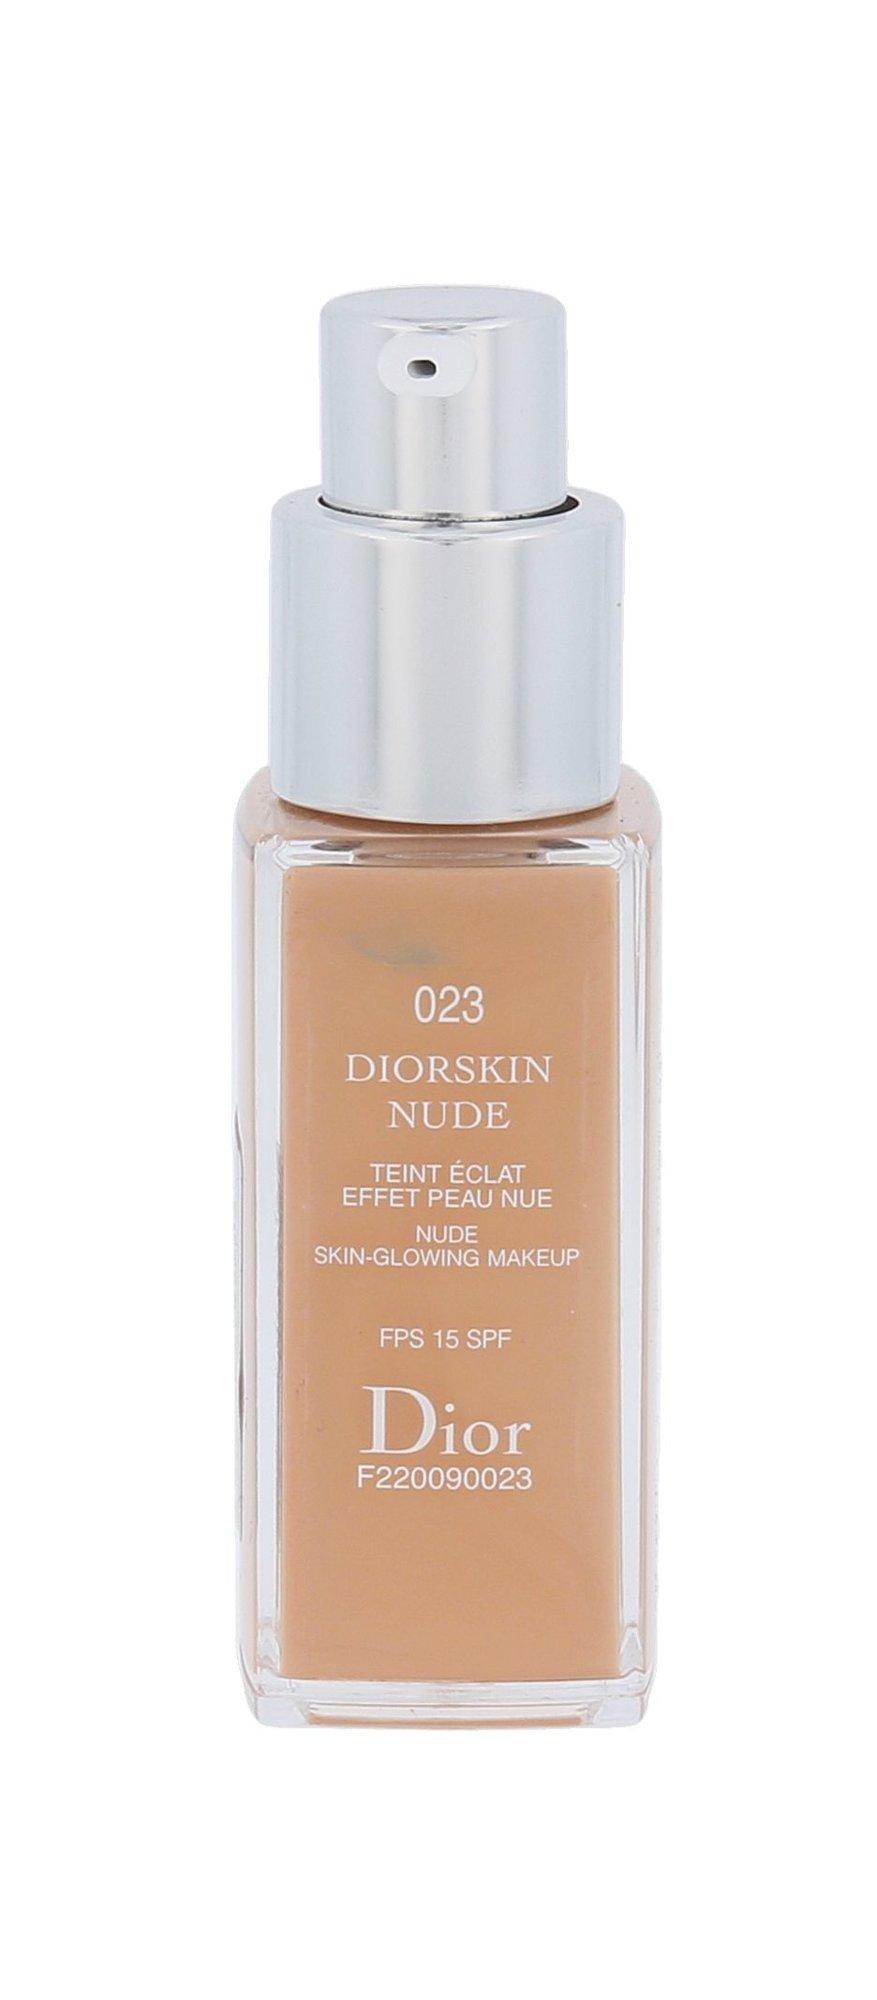 Christian Dior Diorskin Nude Cosmetic 20ml 023 Peach